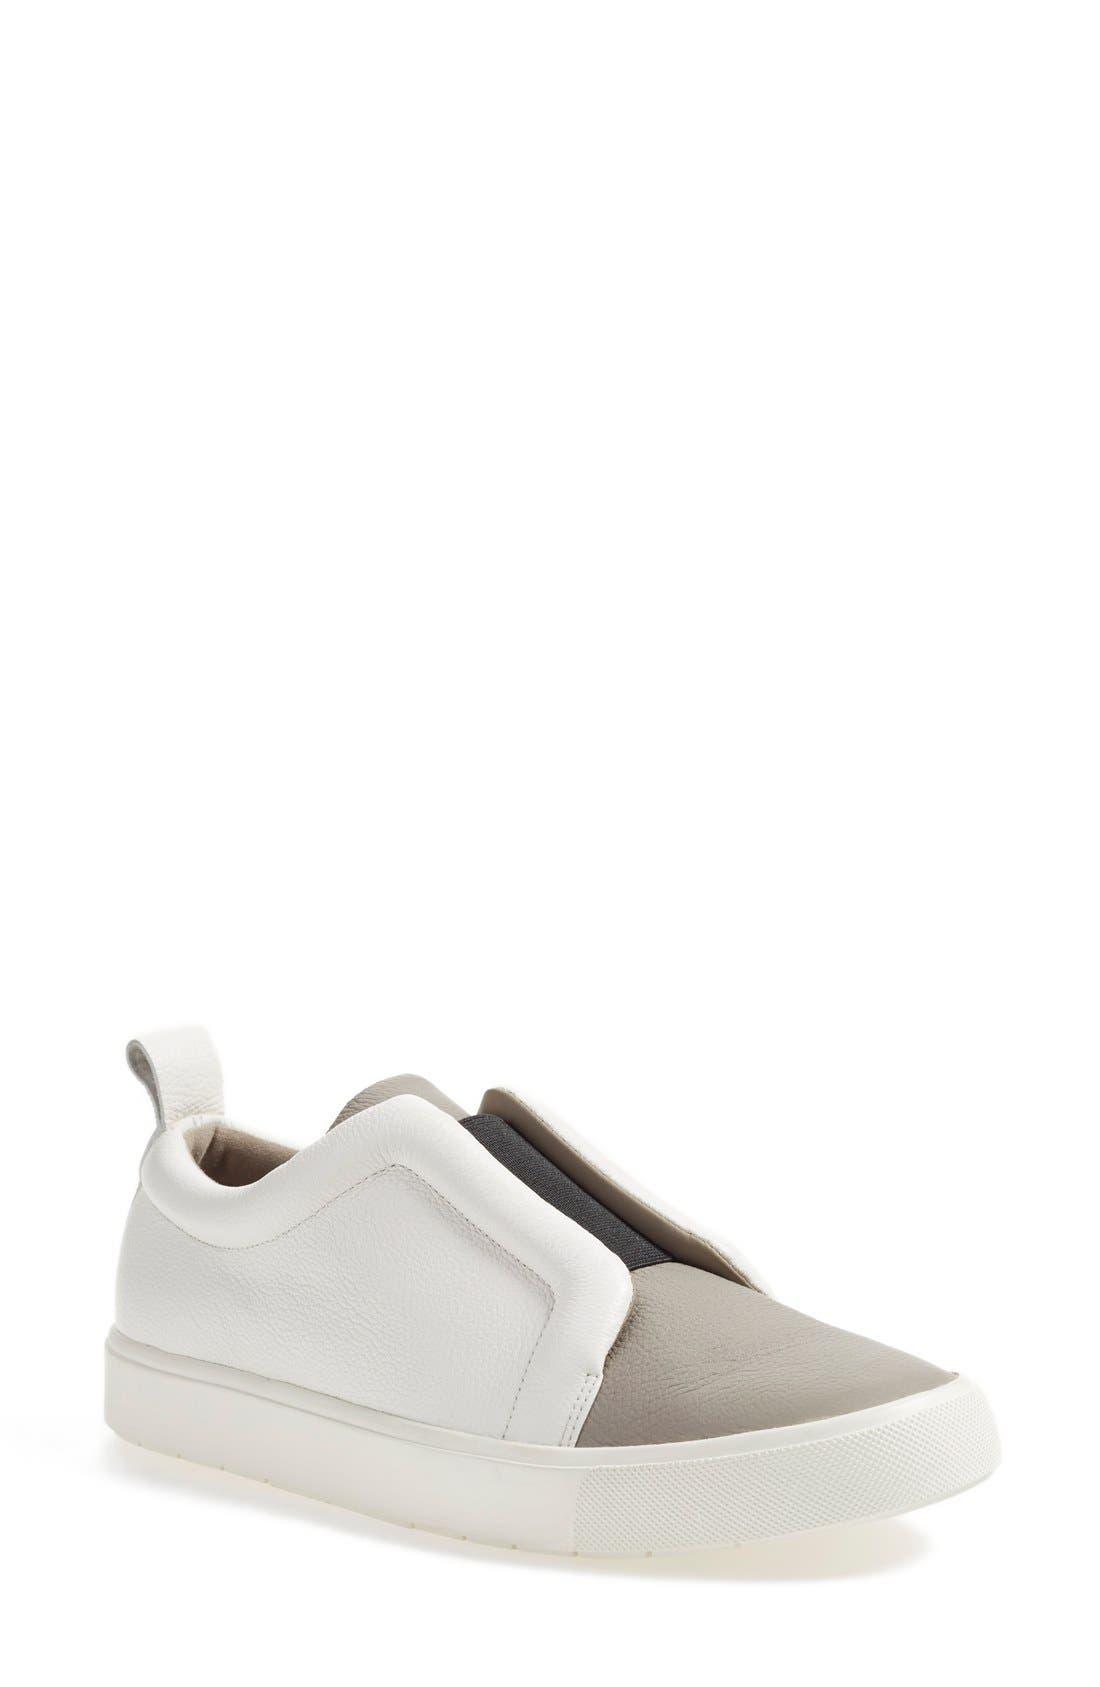 Vince 'Caden' Slip-On Sneaker (Women)